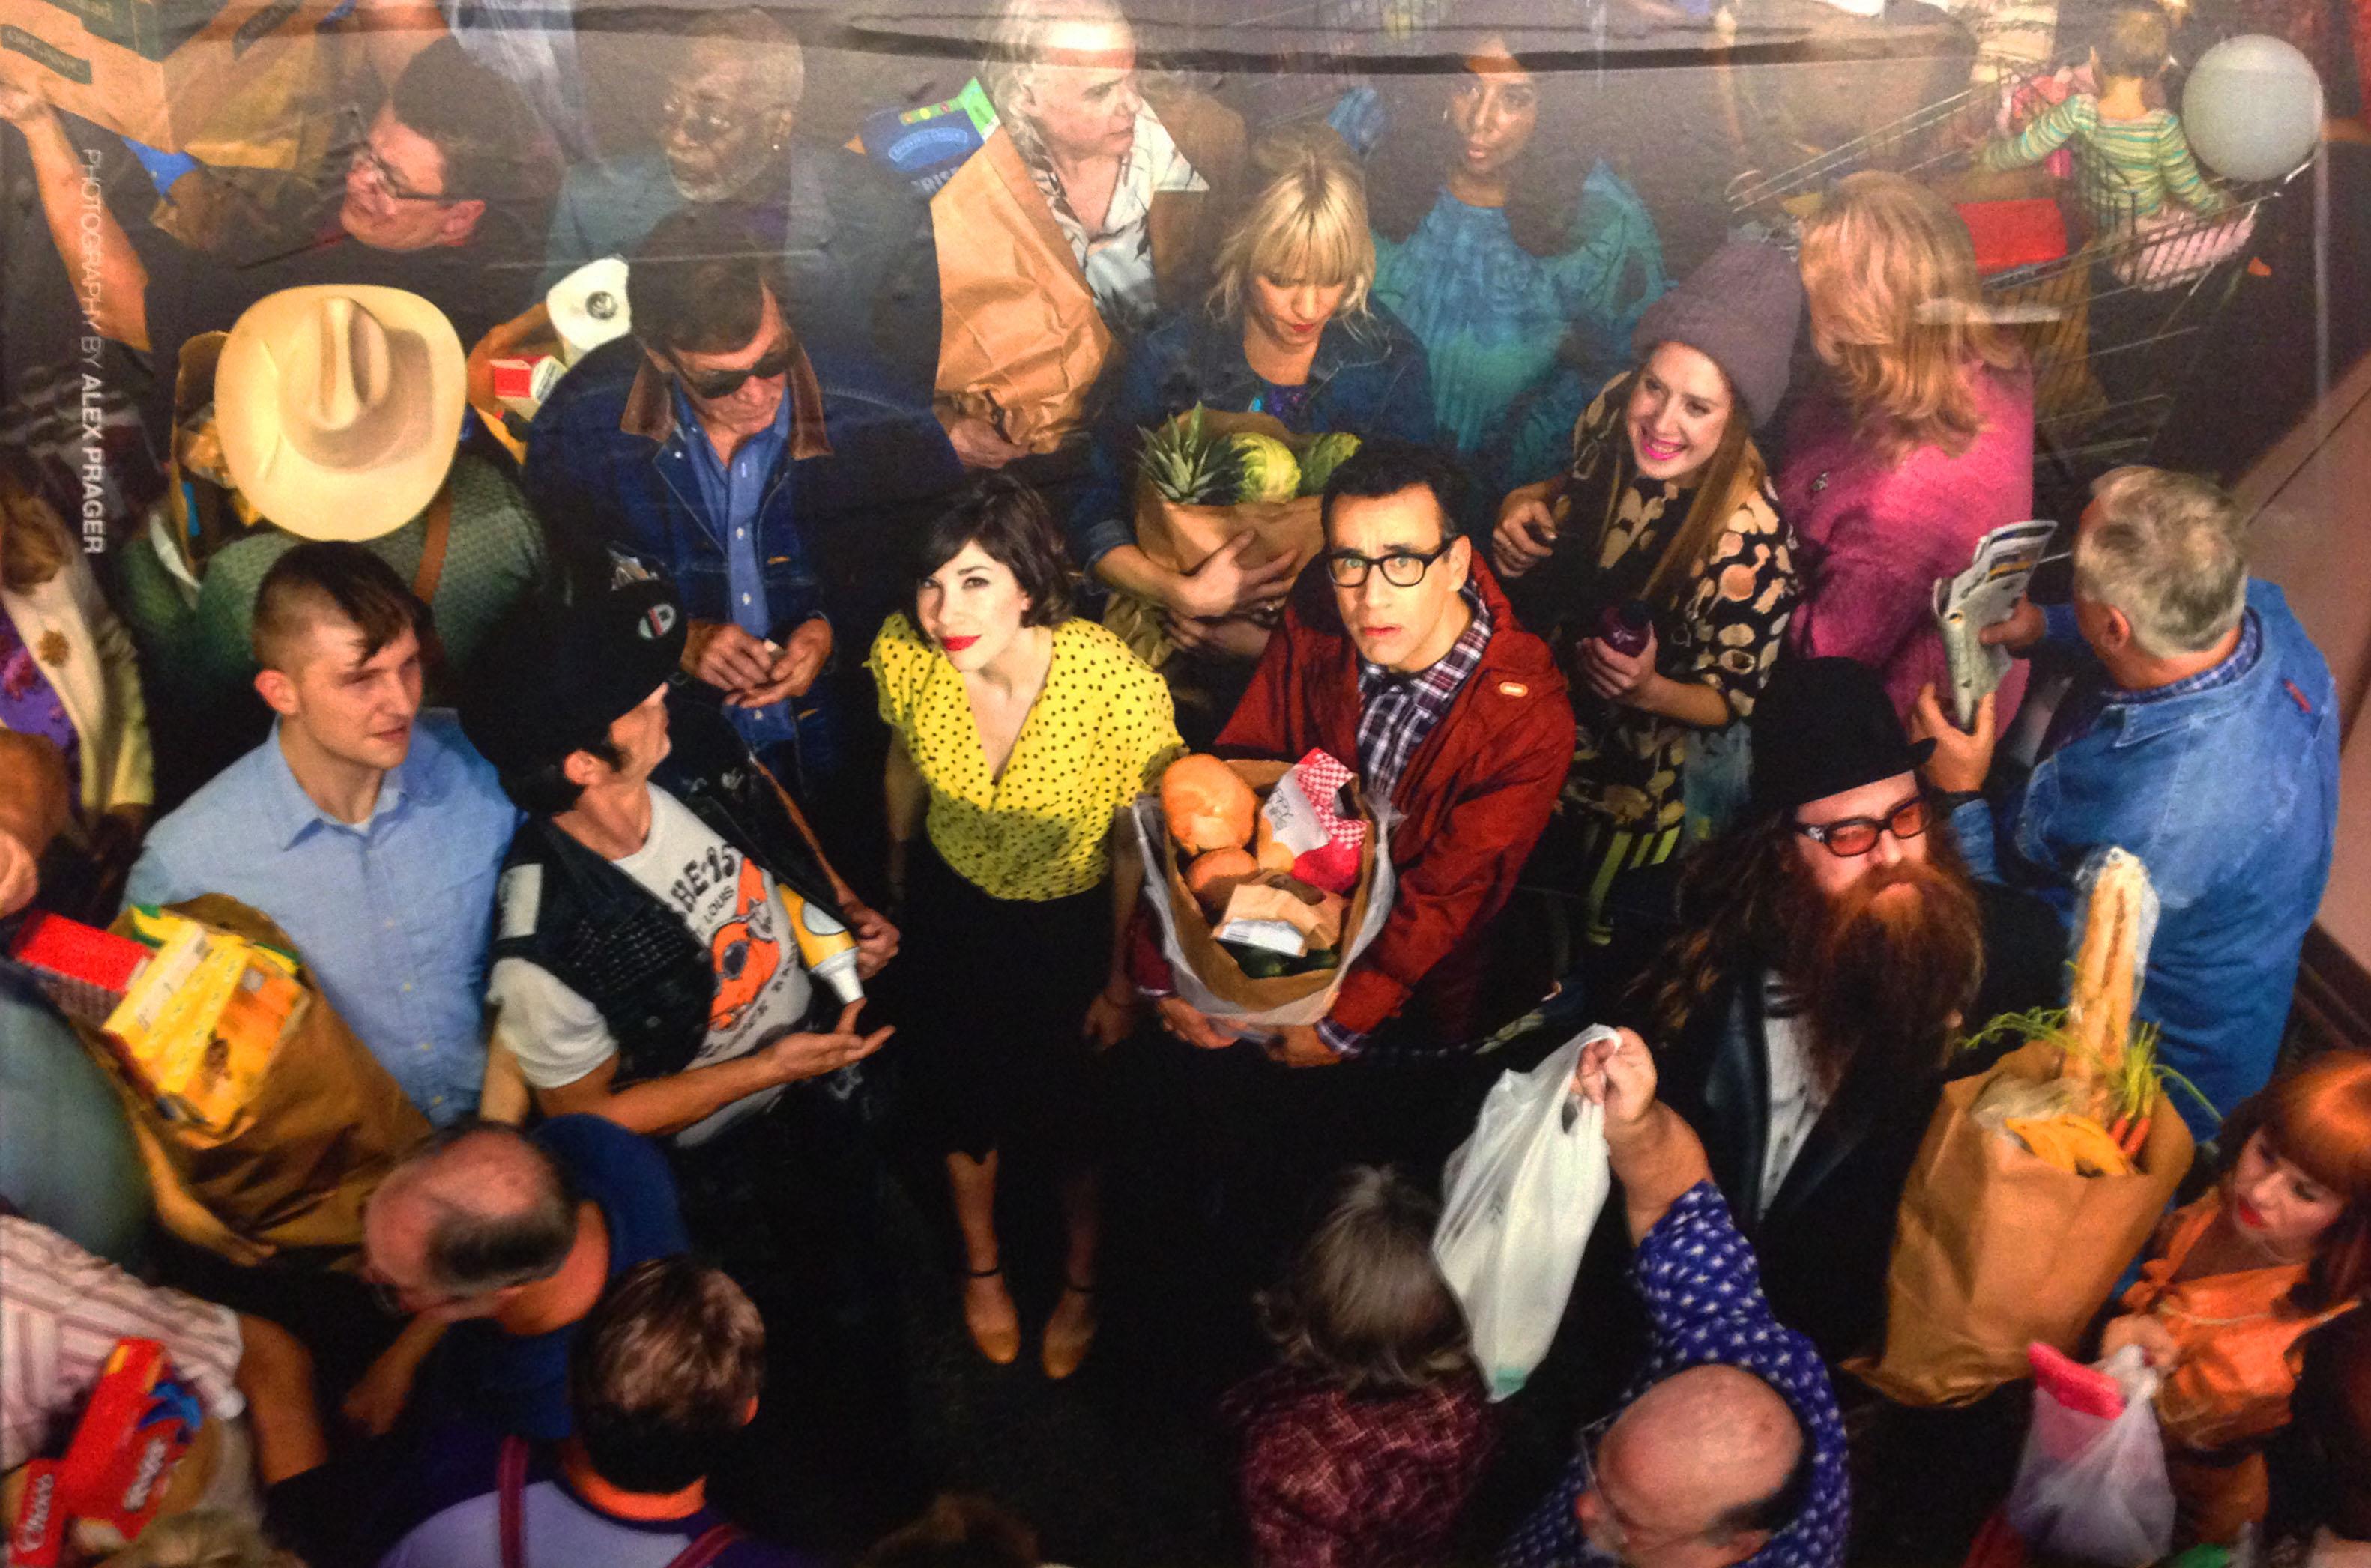 Portlandia subway advertisement, Photographed by Alex Prager, 2014